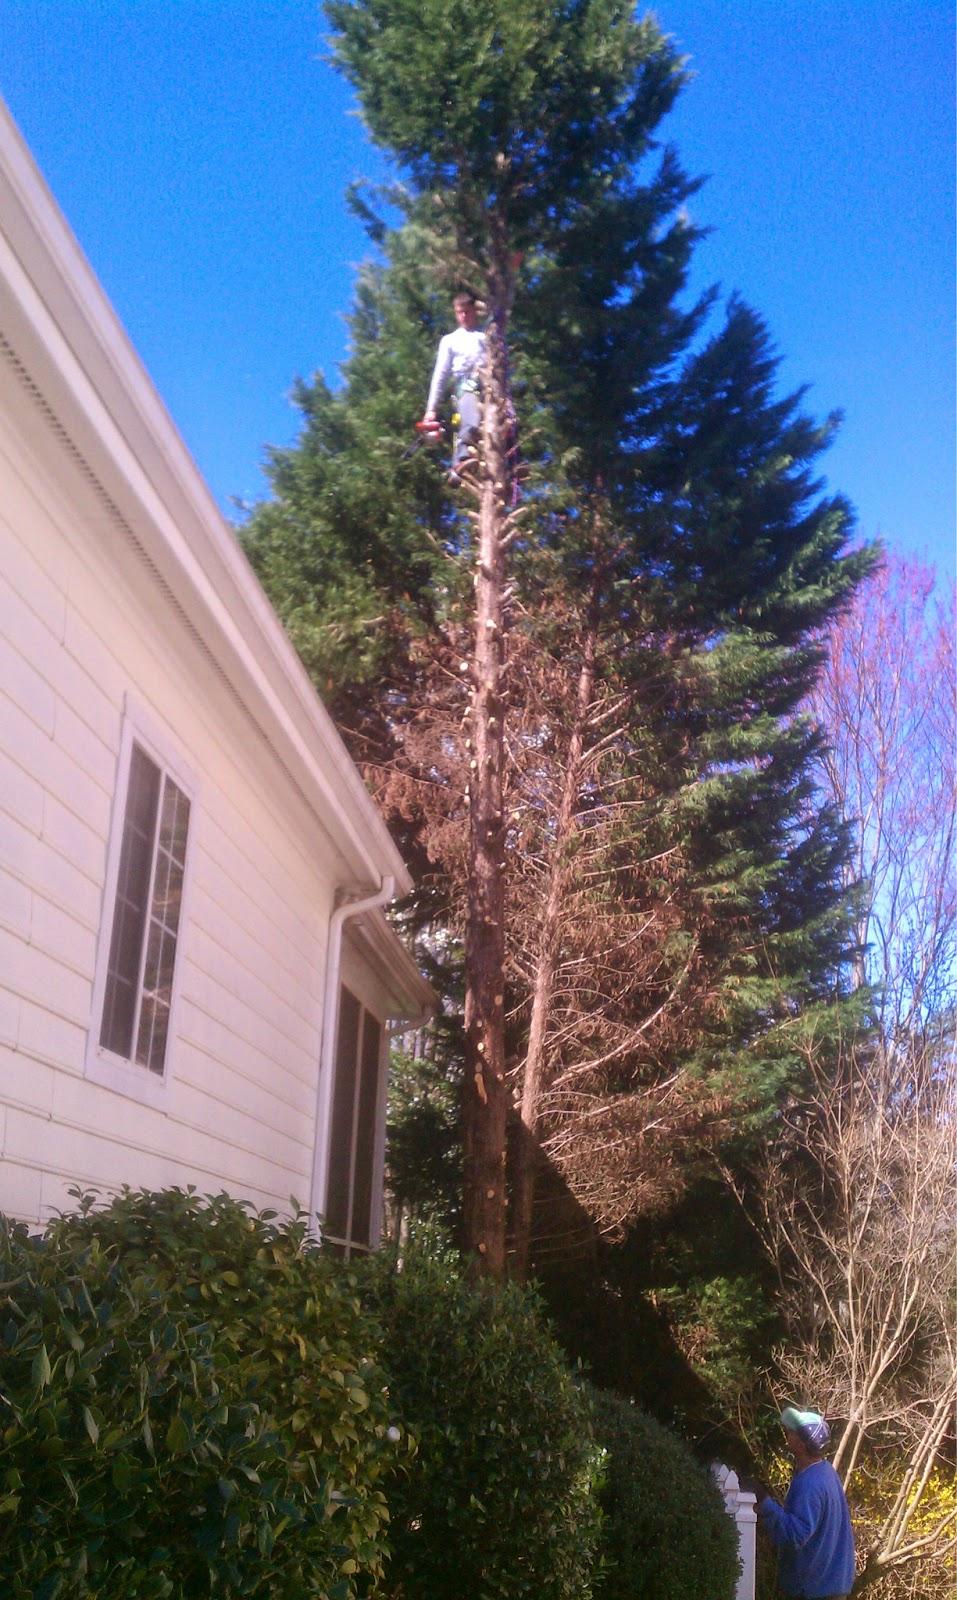 COMBS' TREE SERVICE